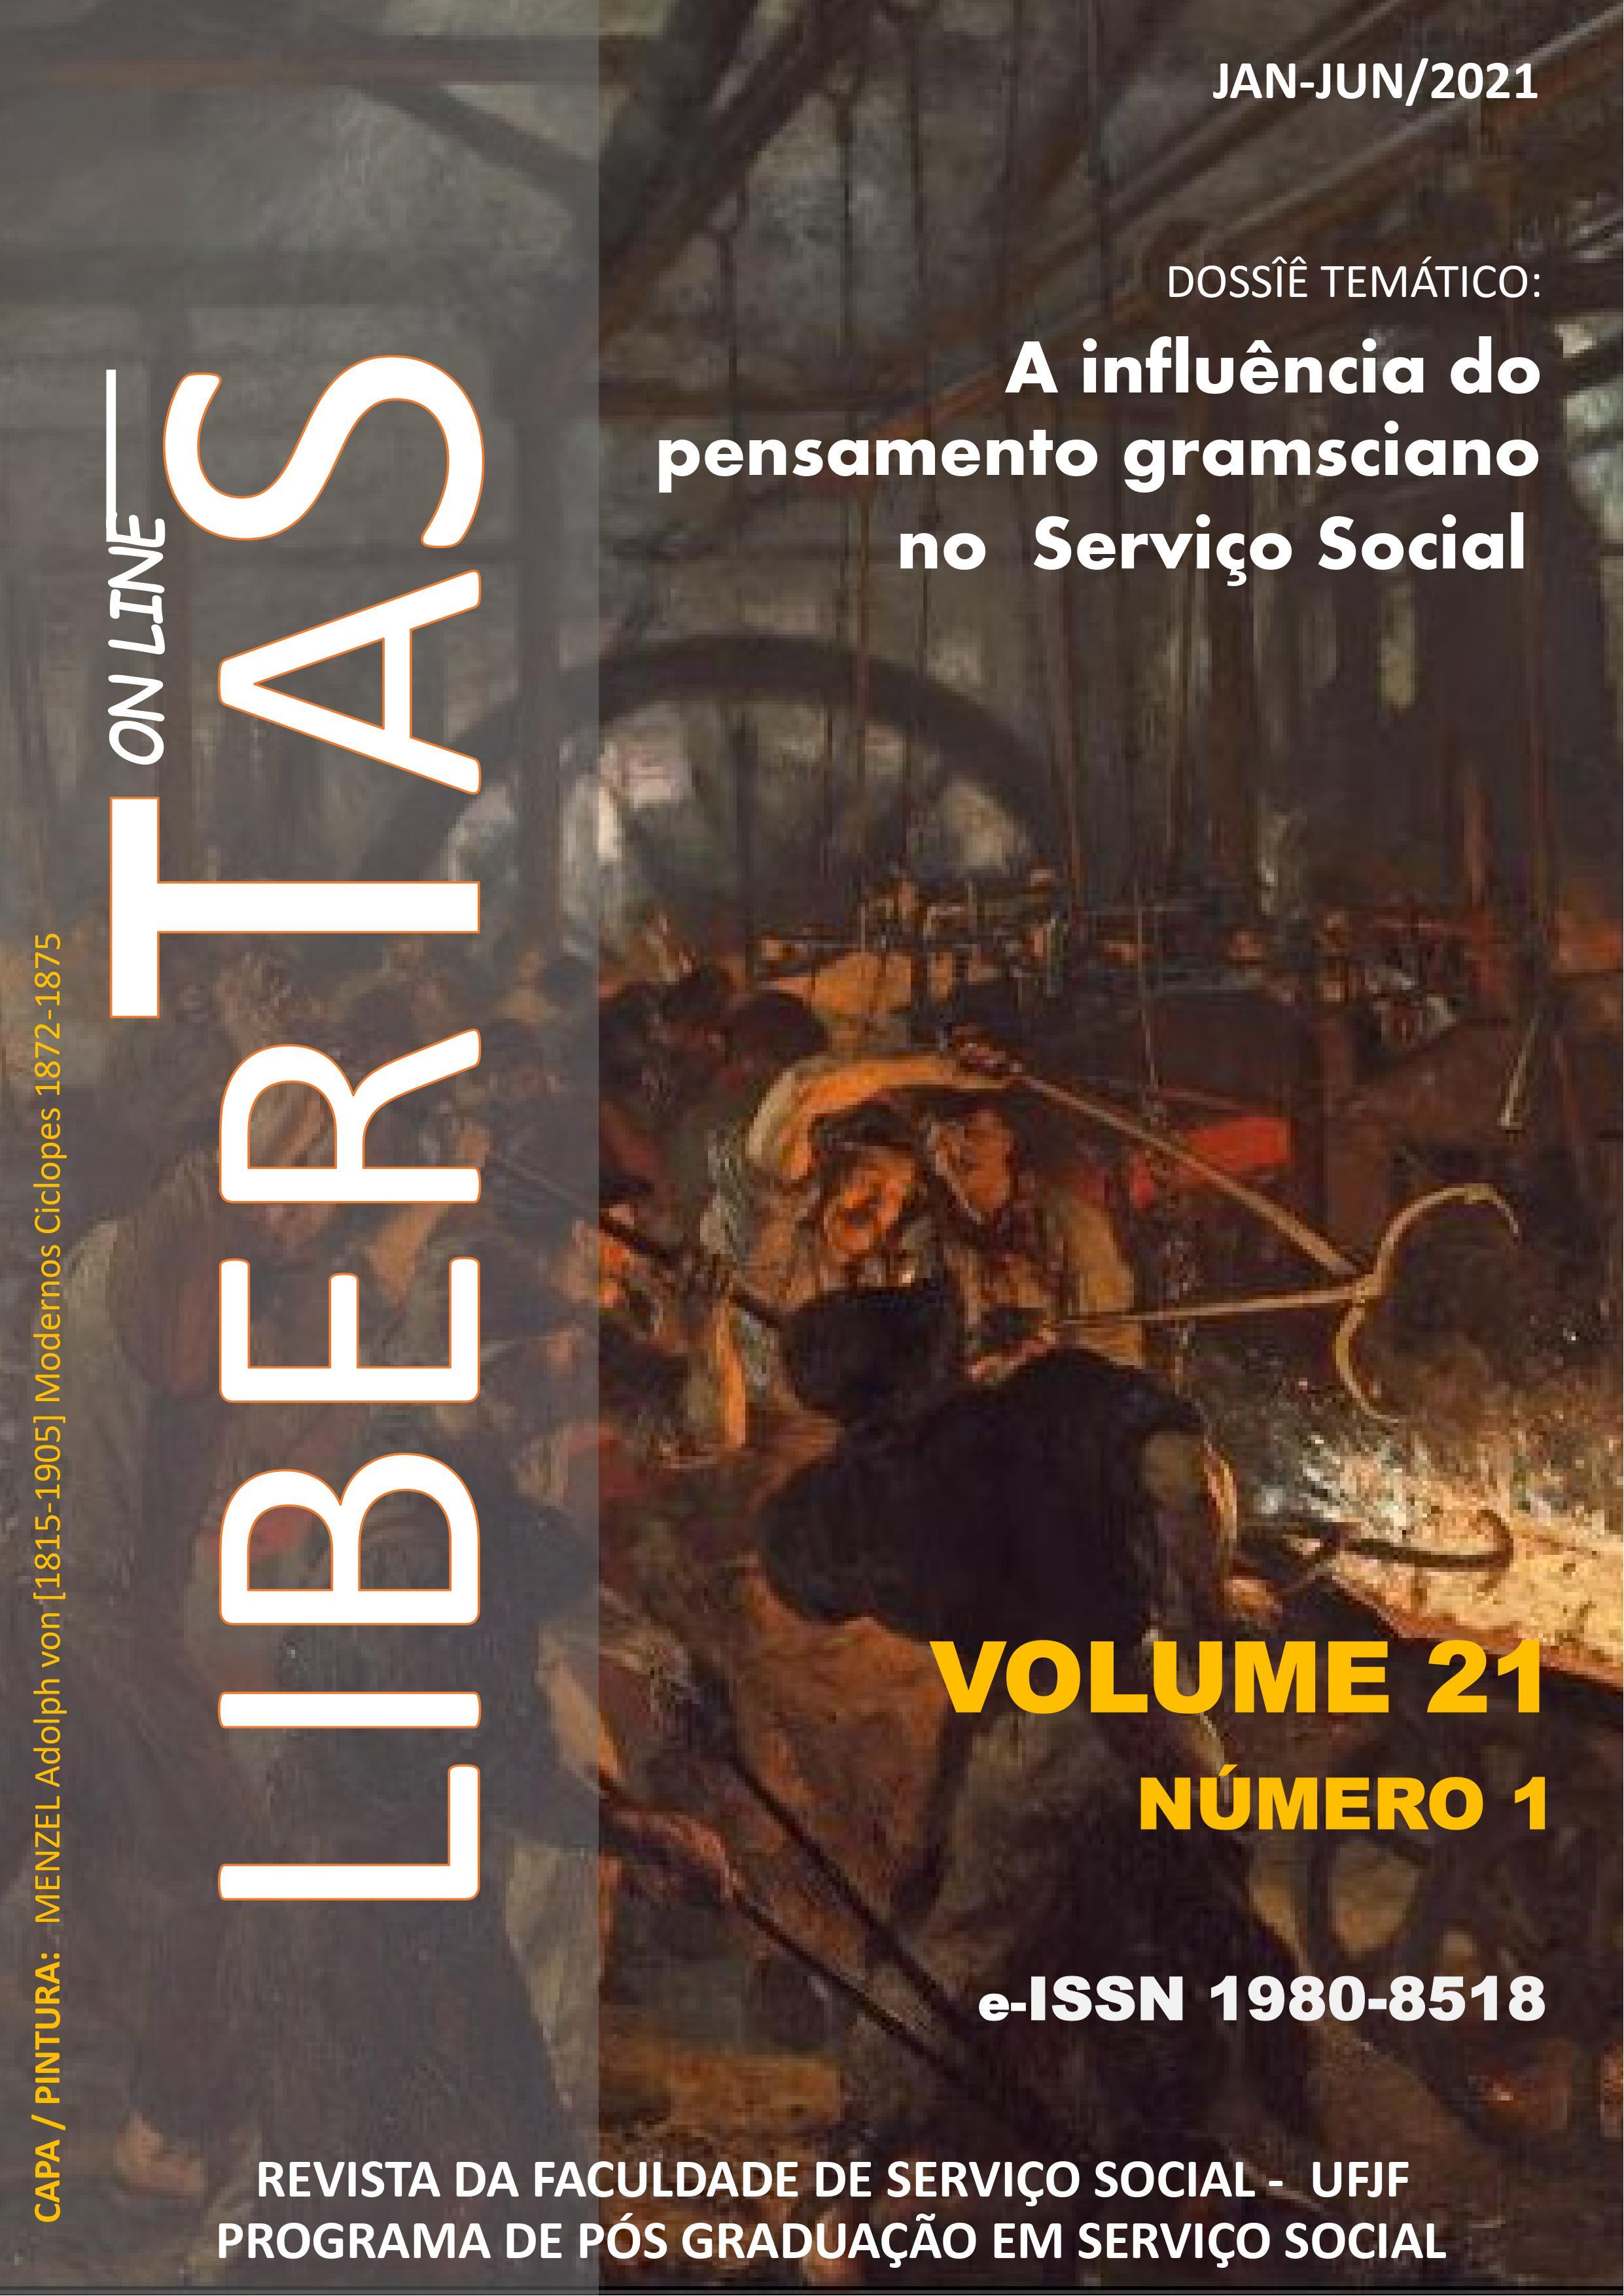 Visualizar v. 21 n. 1 (2021): Revista Libertas - ISSN: 1980-8518 (jan / jun 2021)